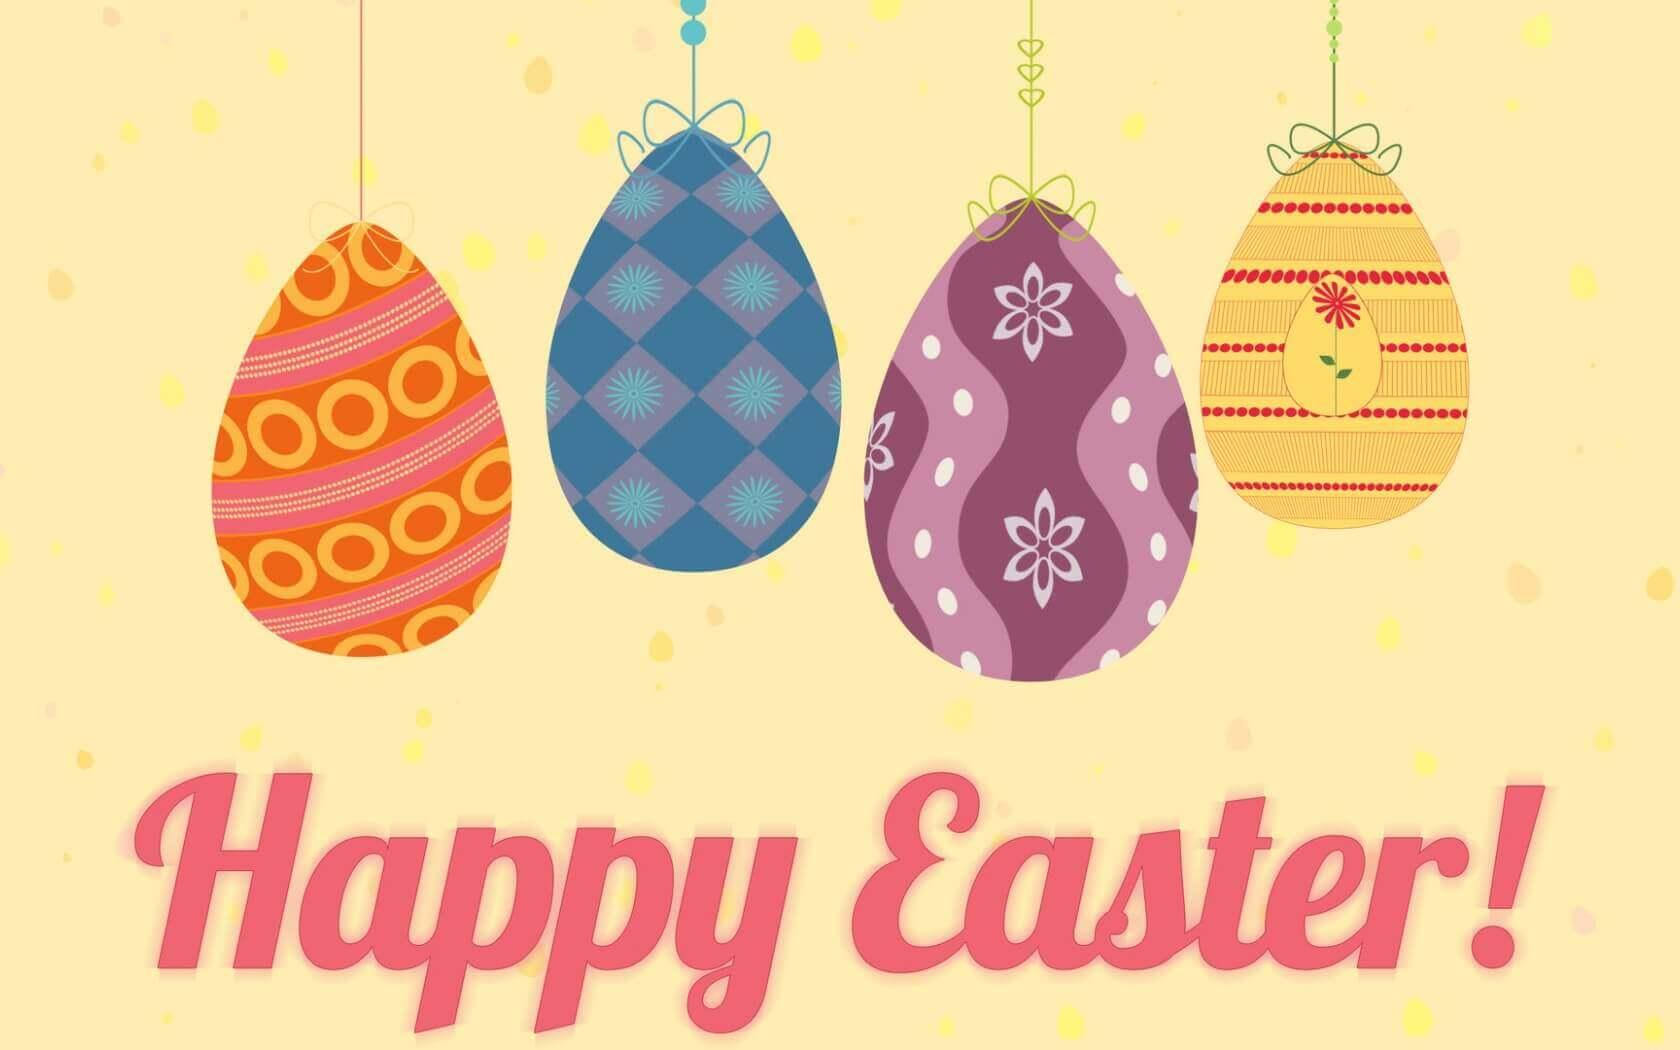 Happy Easter wallpaper image